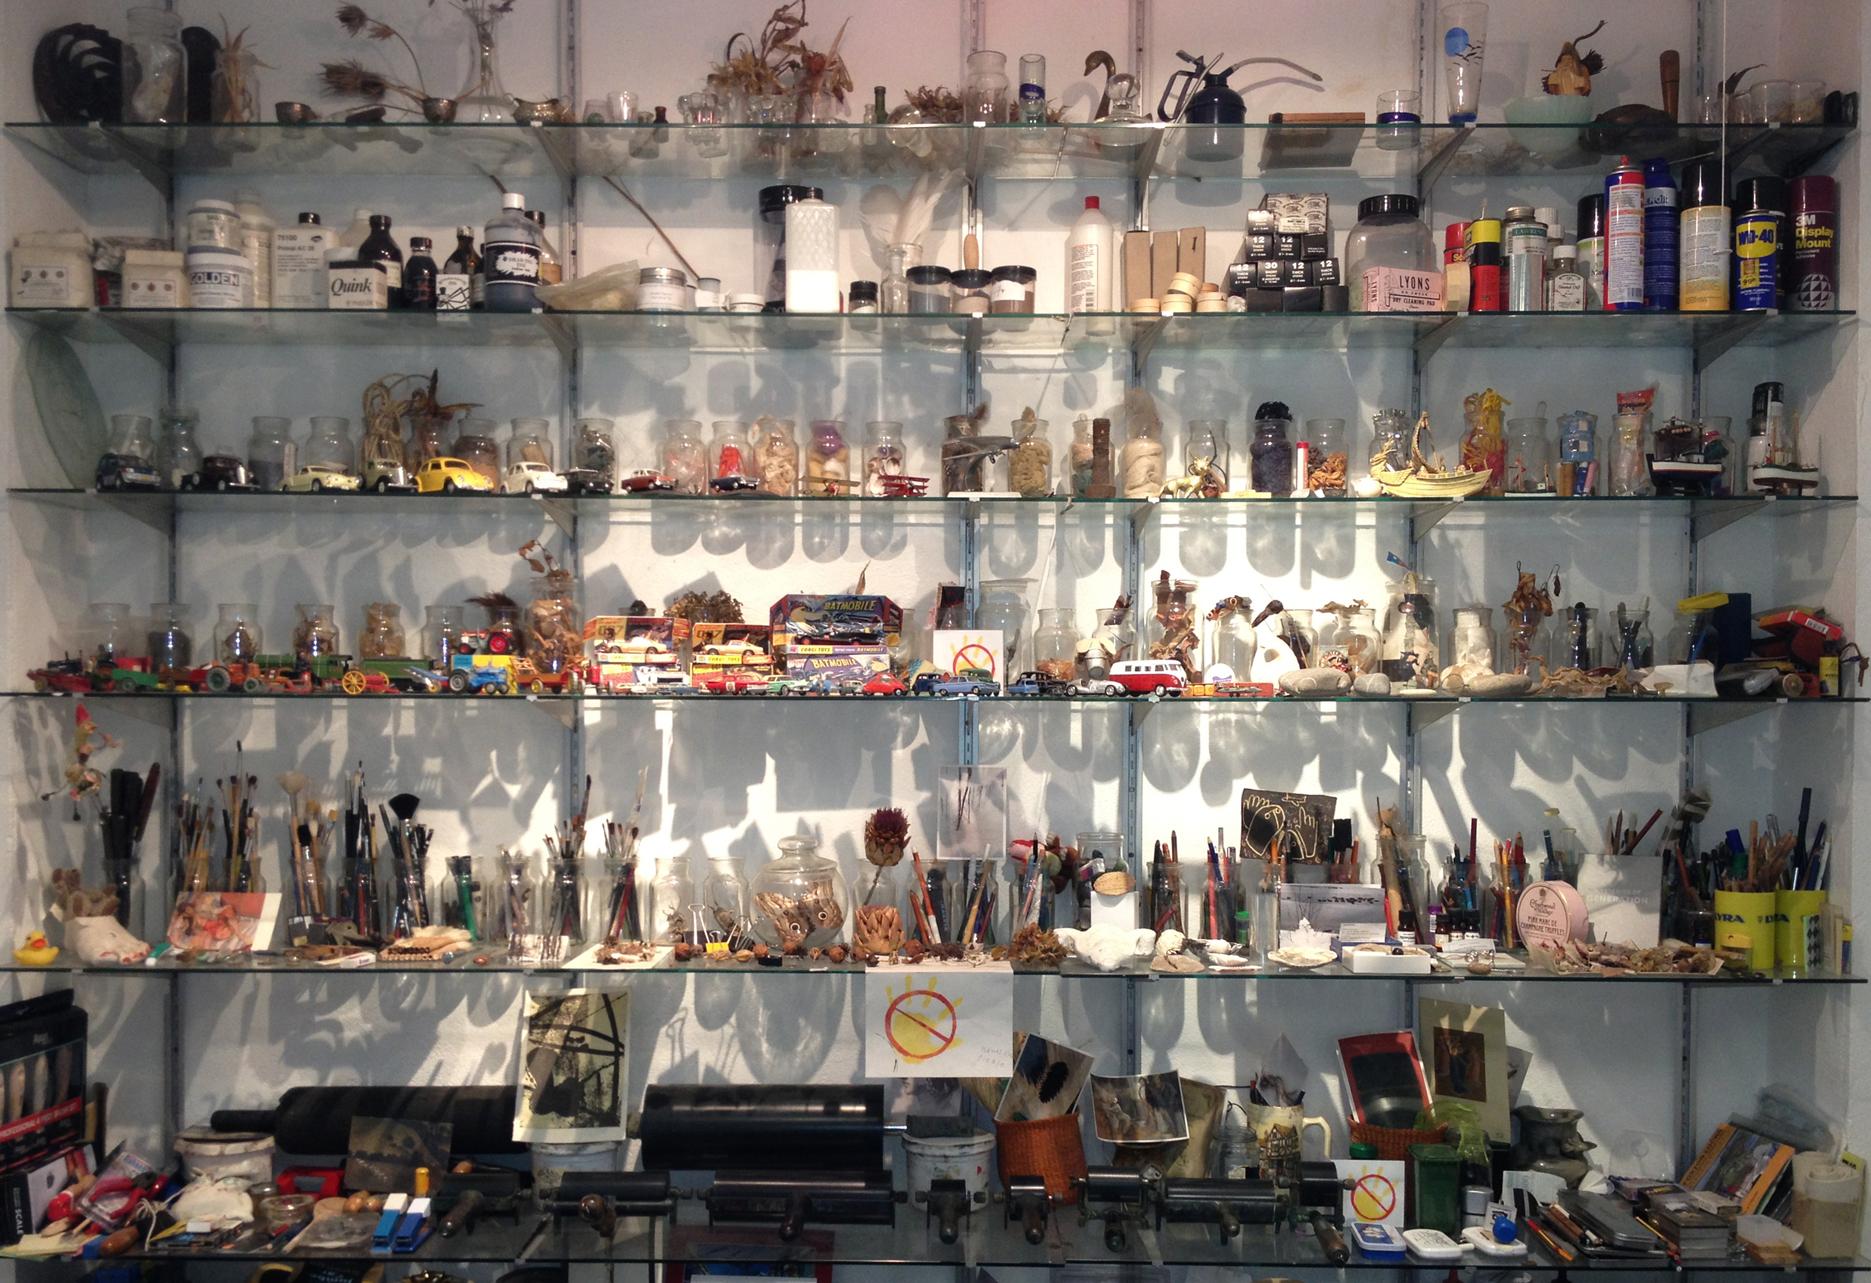 Jamworks: Toys, tools and treasures